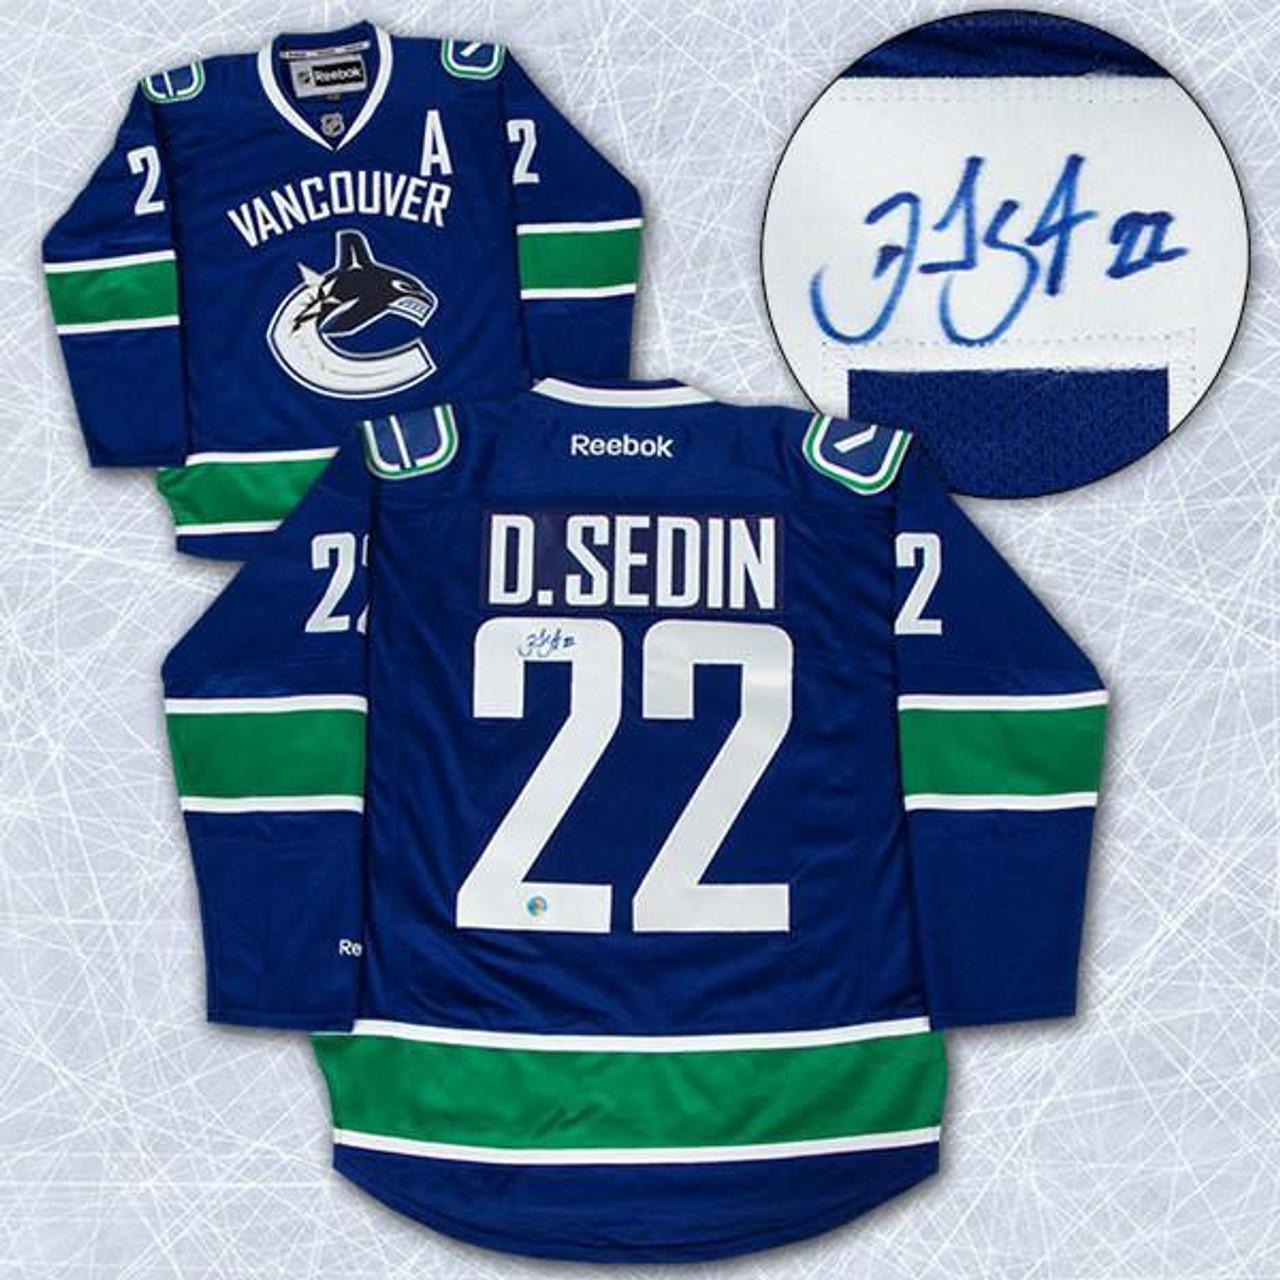 brand new cccf7 2f016 Daniel Sedin Vancouver Canucks Autographed Reebok Replica Jersey